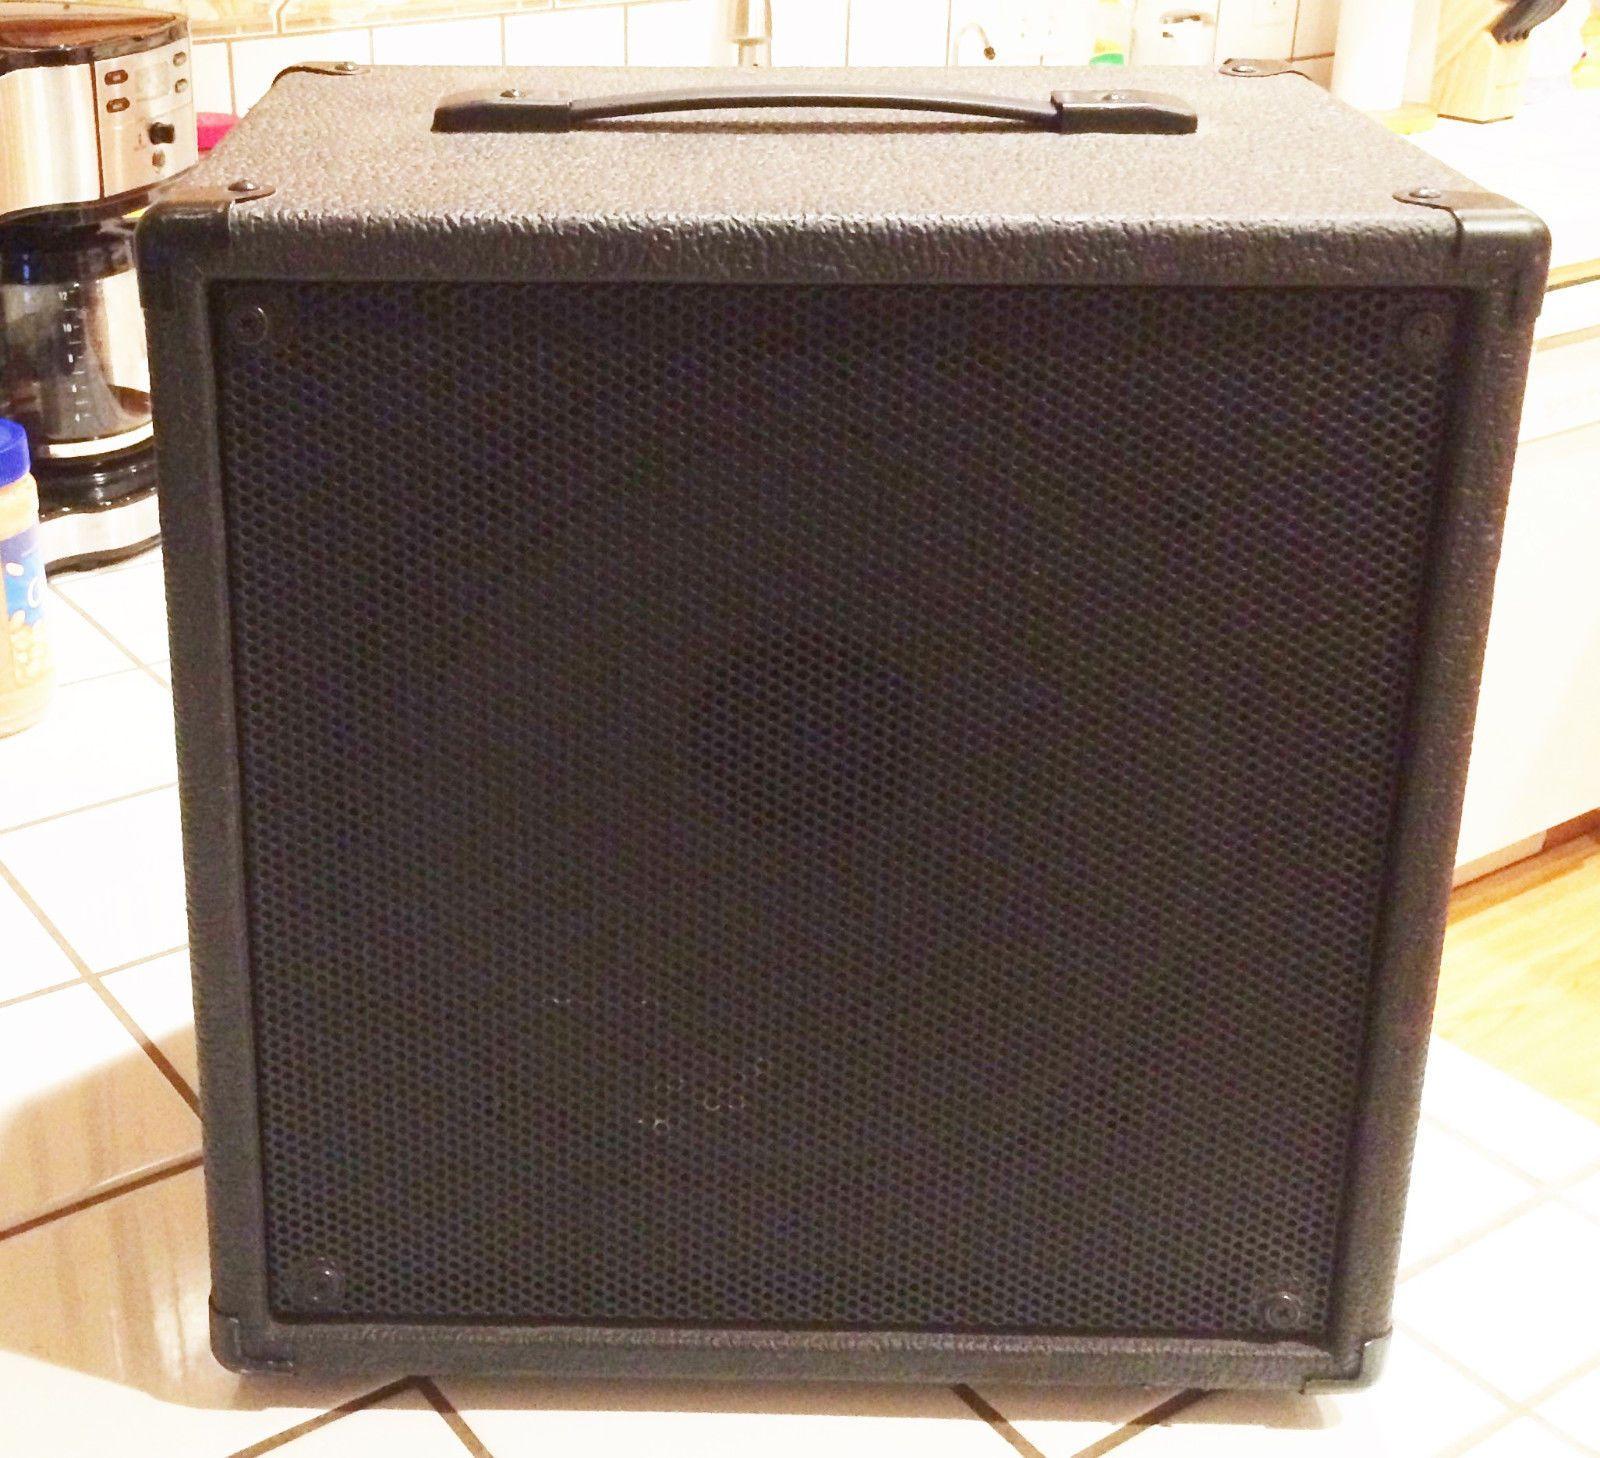 Wavebid CRATE 151 Item 2 Electro Voice Force i 25 Dual 15